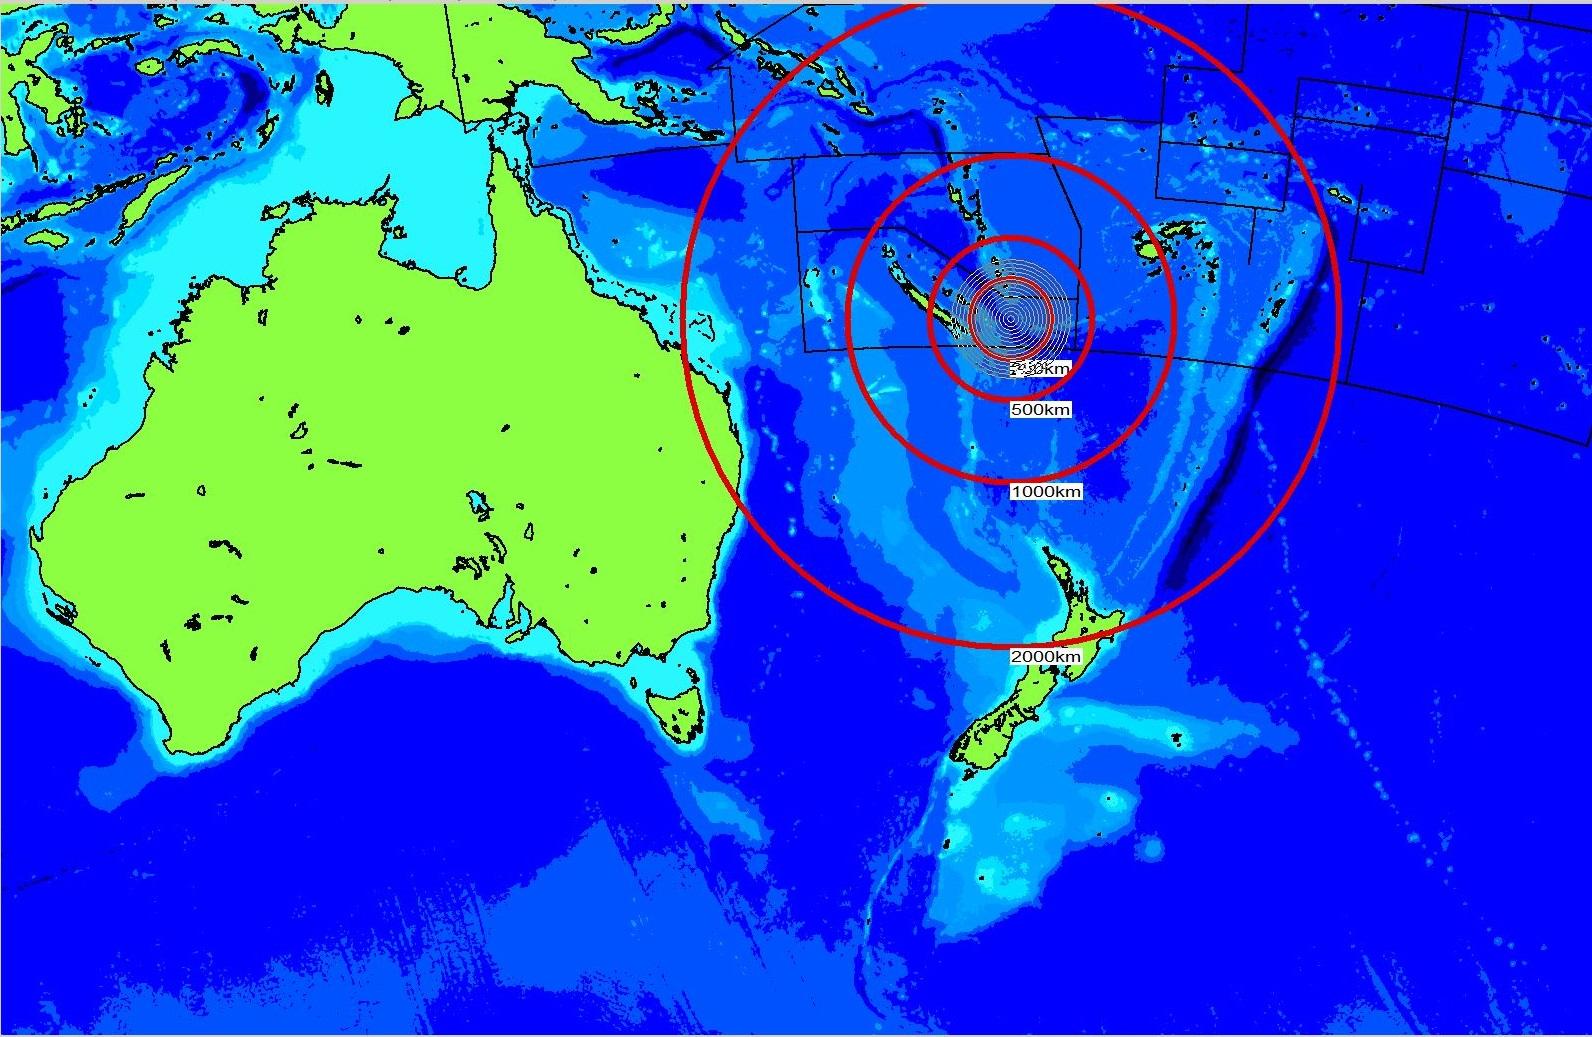 Earthquake on Loyalty Islands_Courtesy NOAA_1558299271133.jpg.jpg